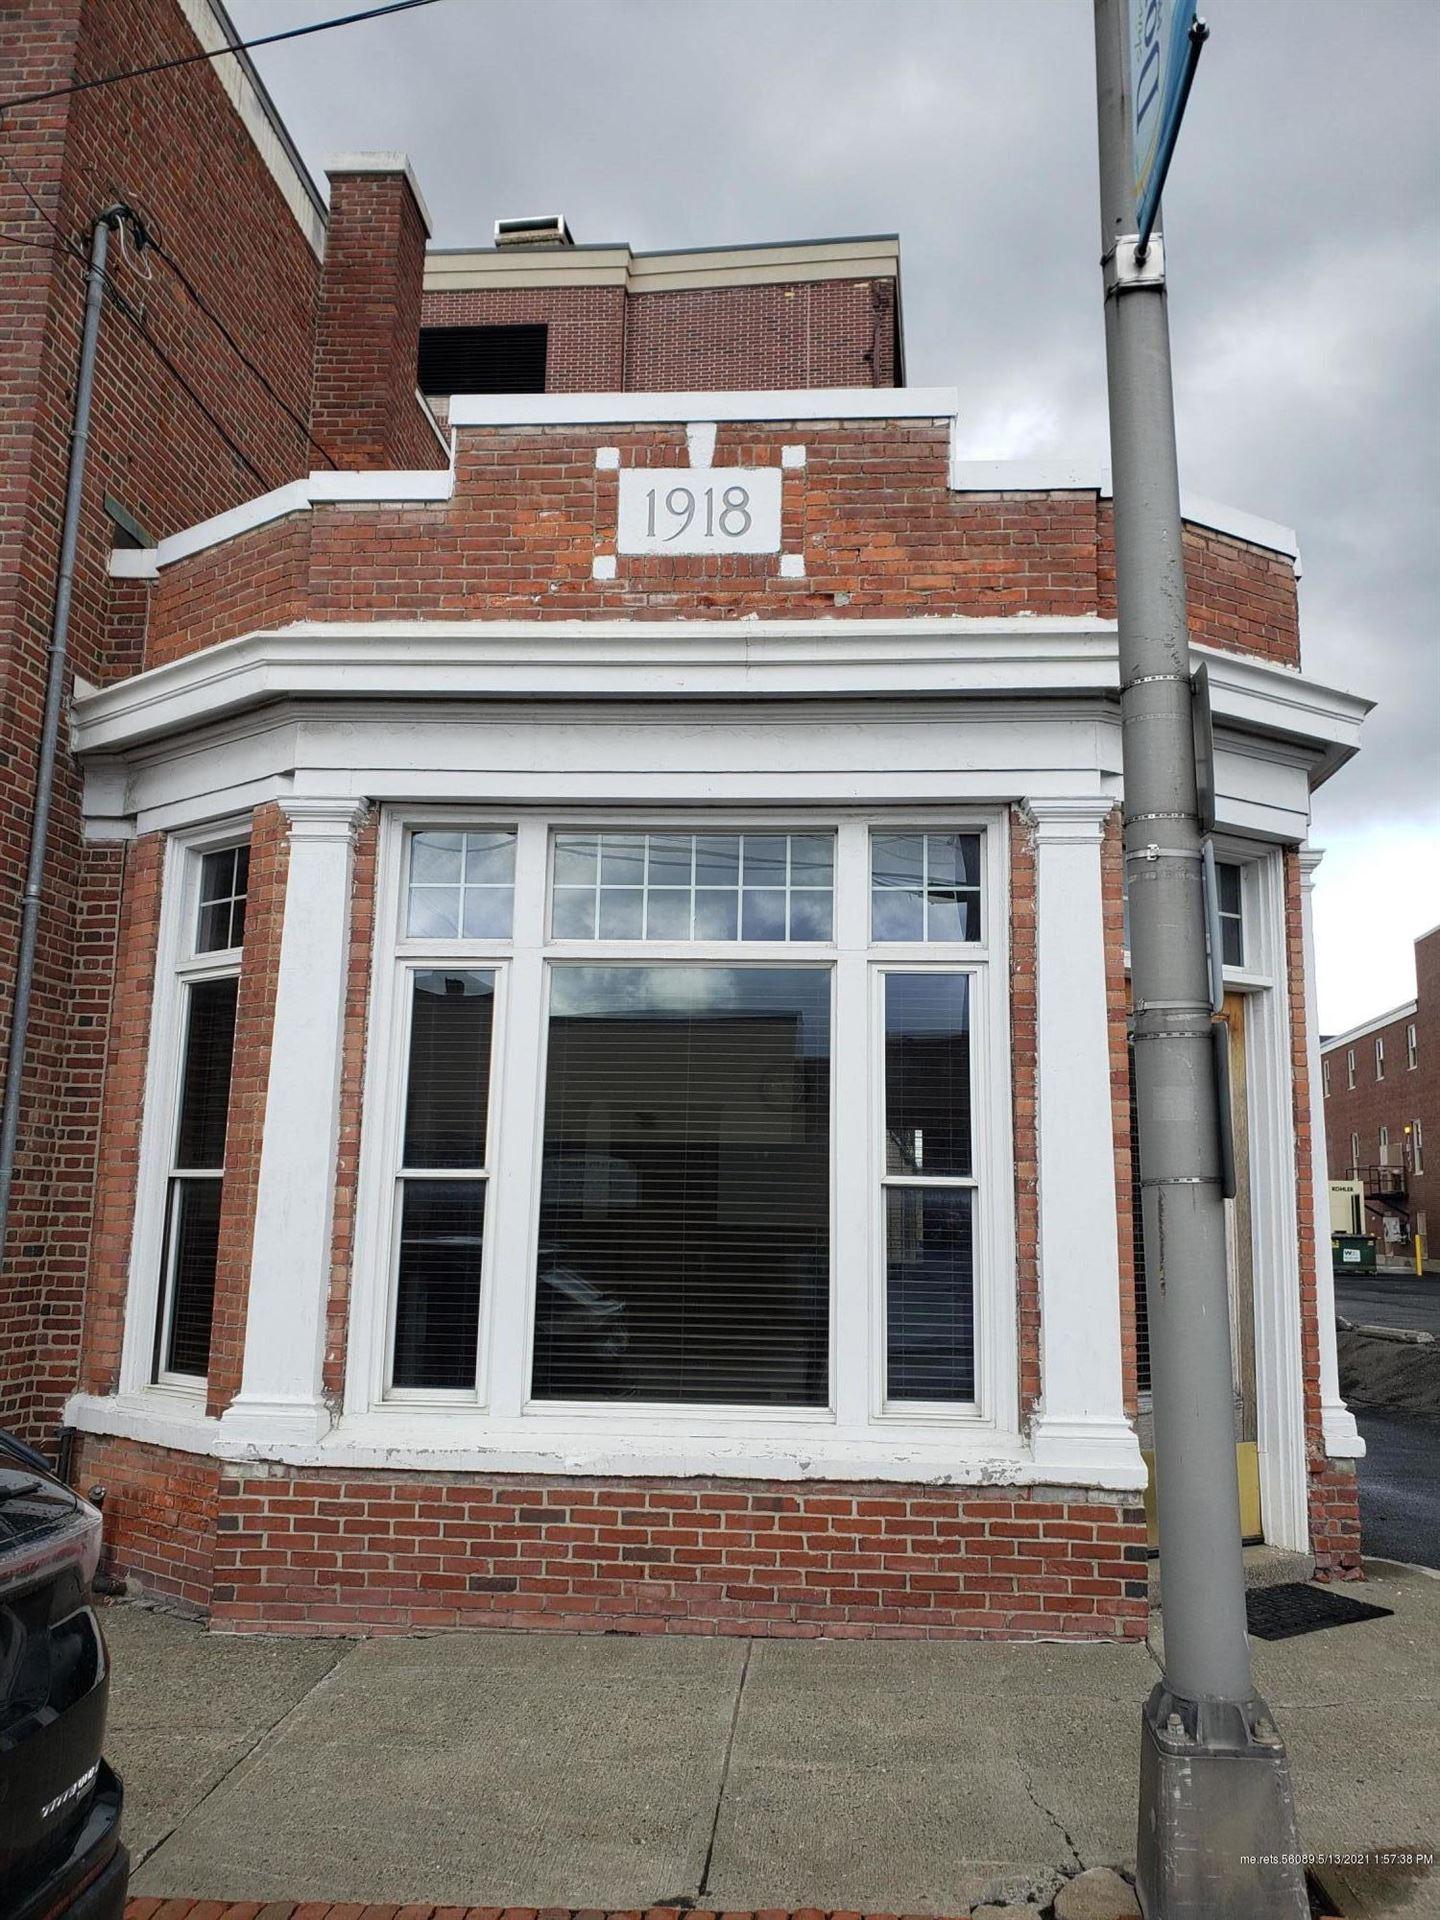 Photo of 197 State Street, Presque Isle, ME 04769 (MLS # 1491386)